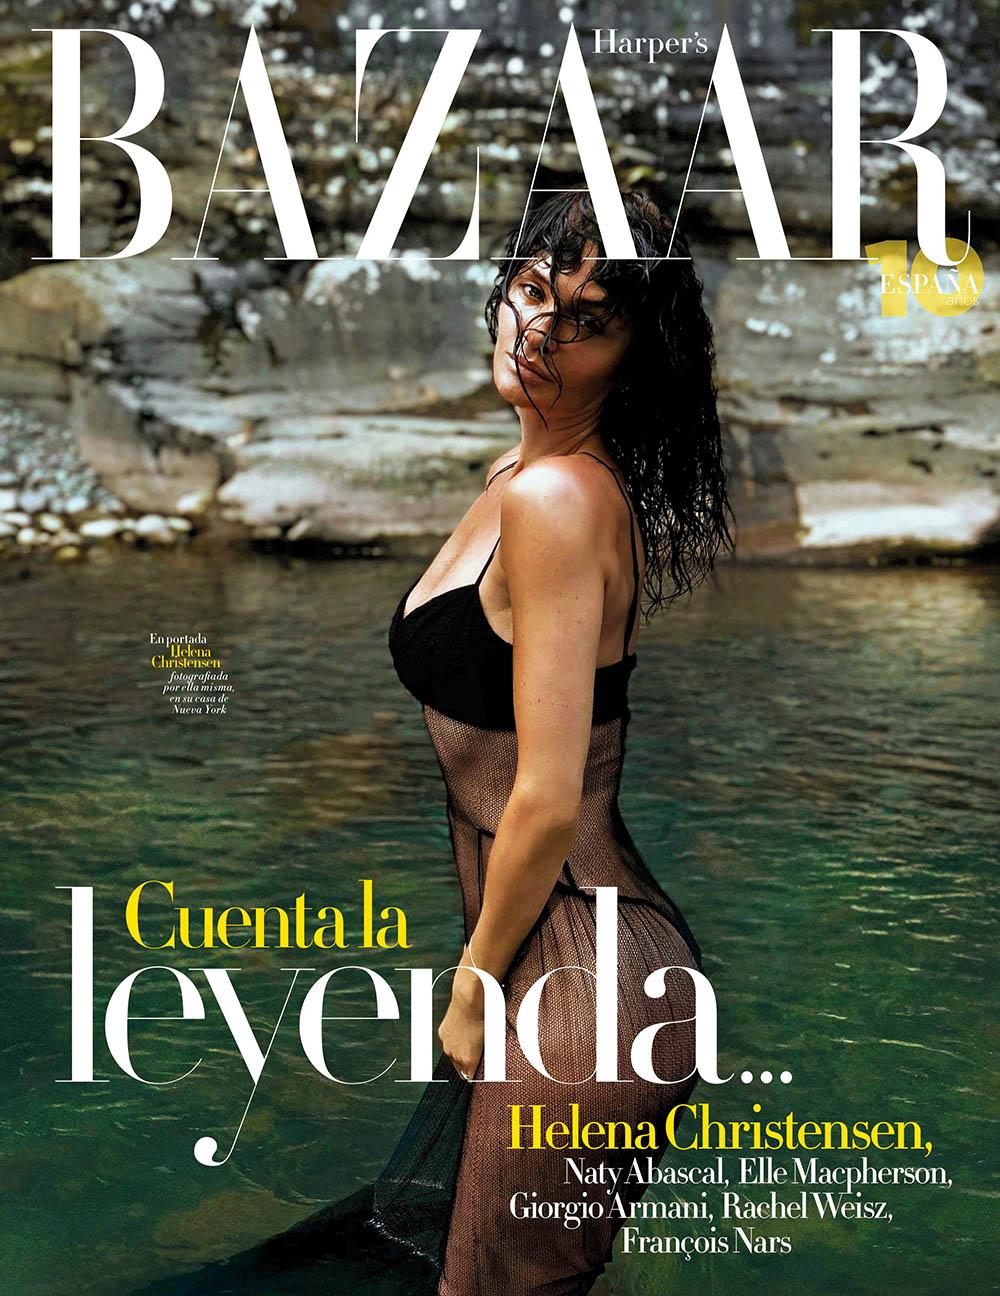 Helena Christensen covers Harper's Bazaar Spain July August 2020 by Helena Christensen